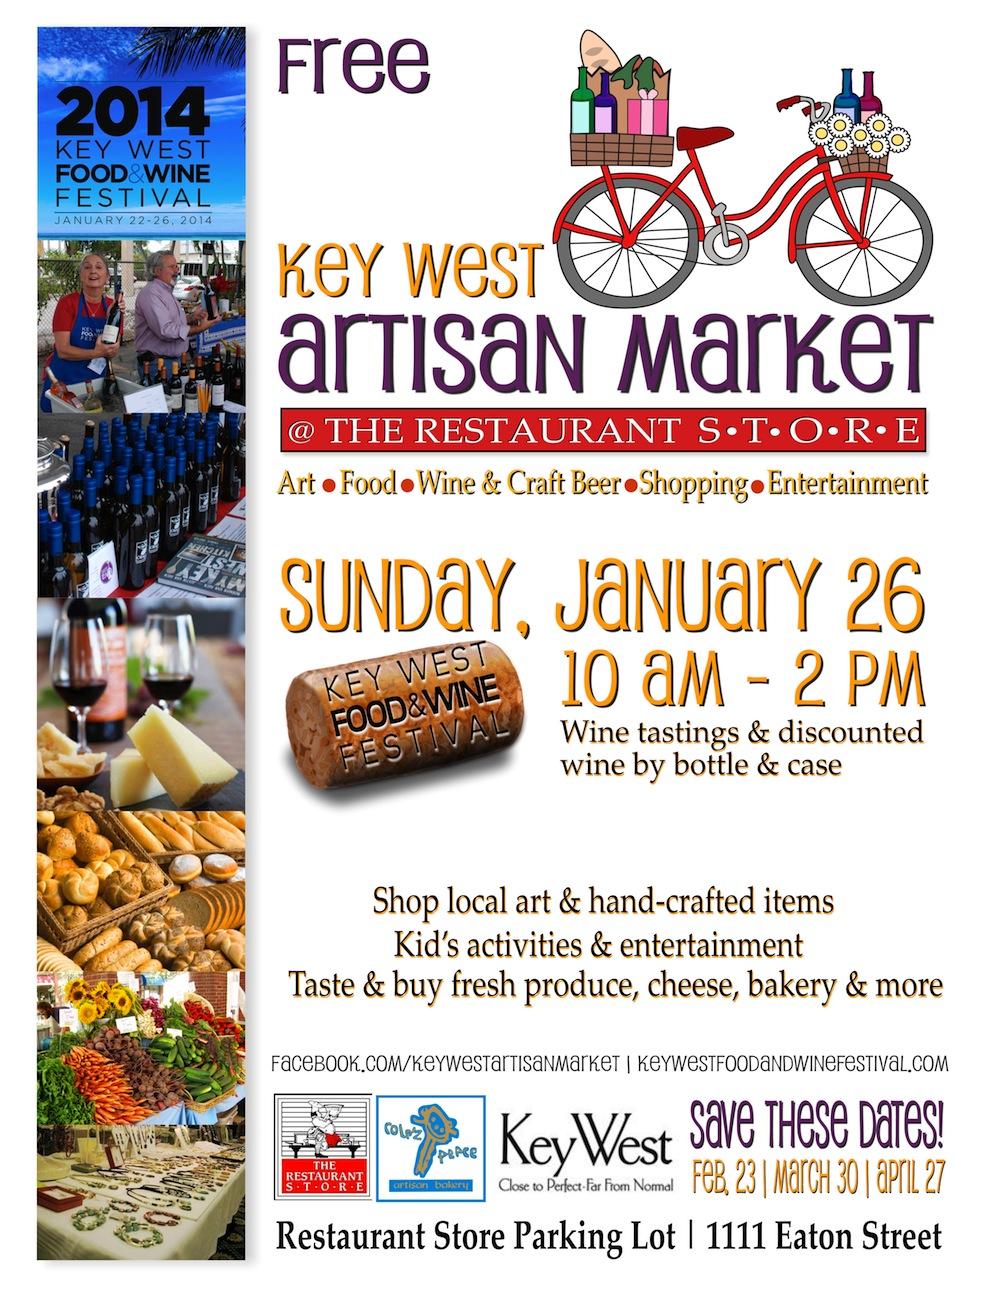 artisasn market flyer f&w festival